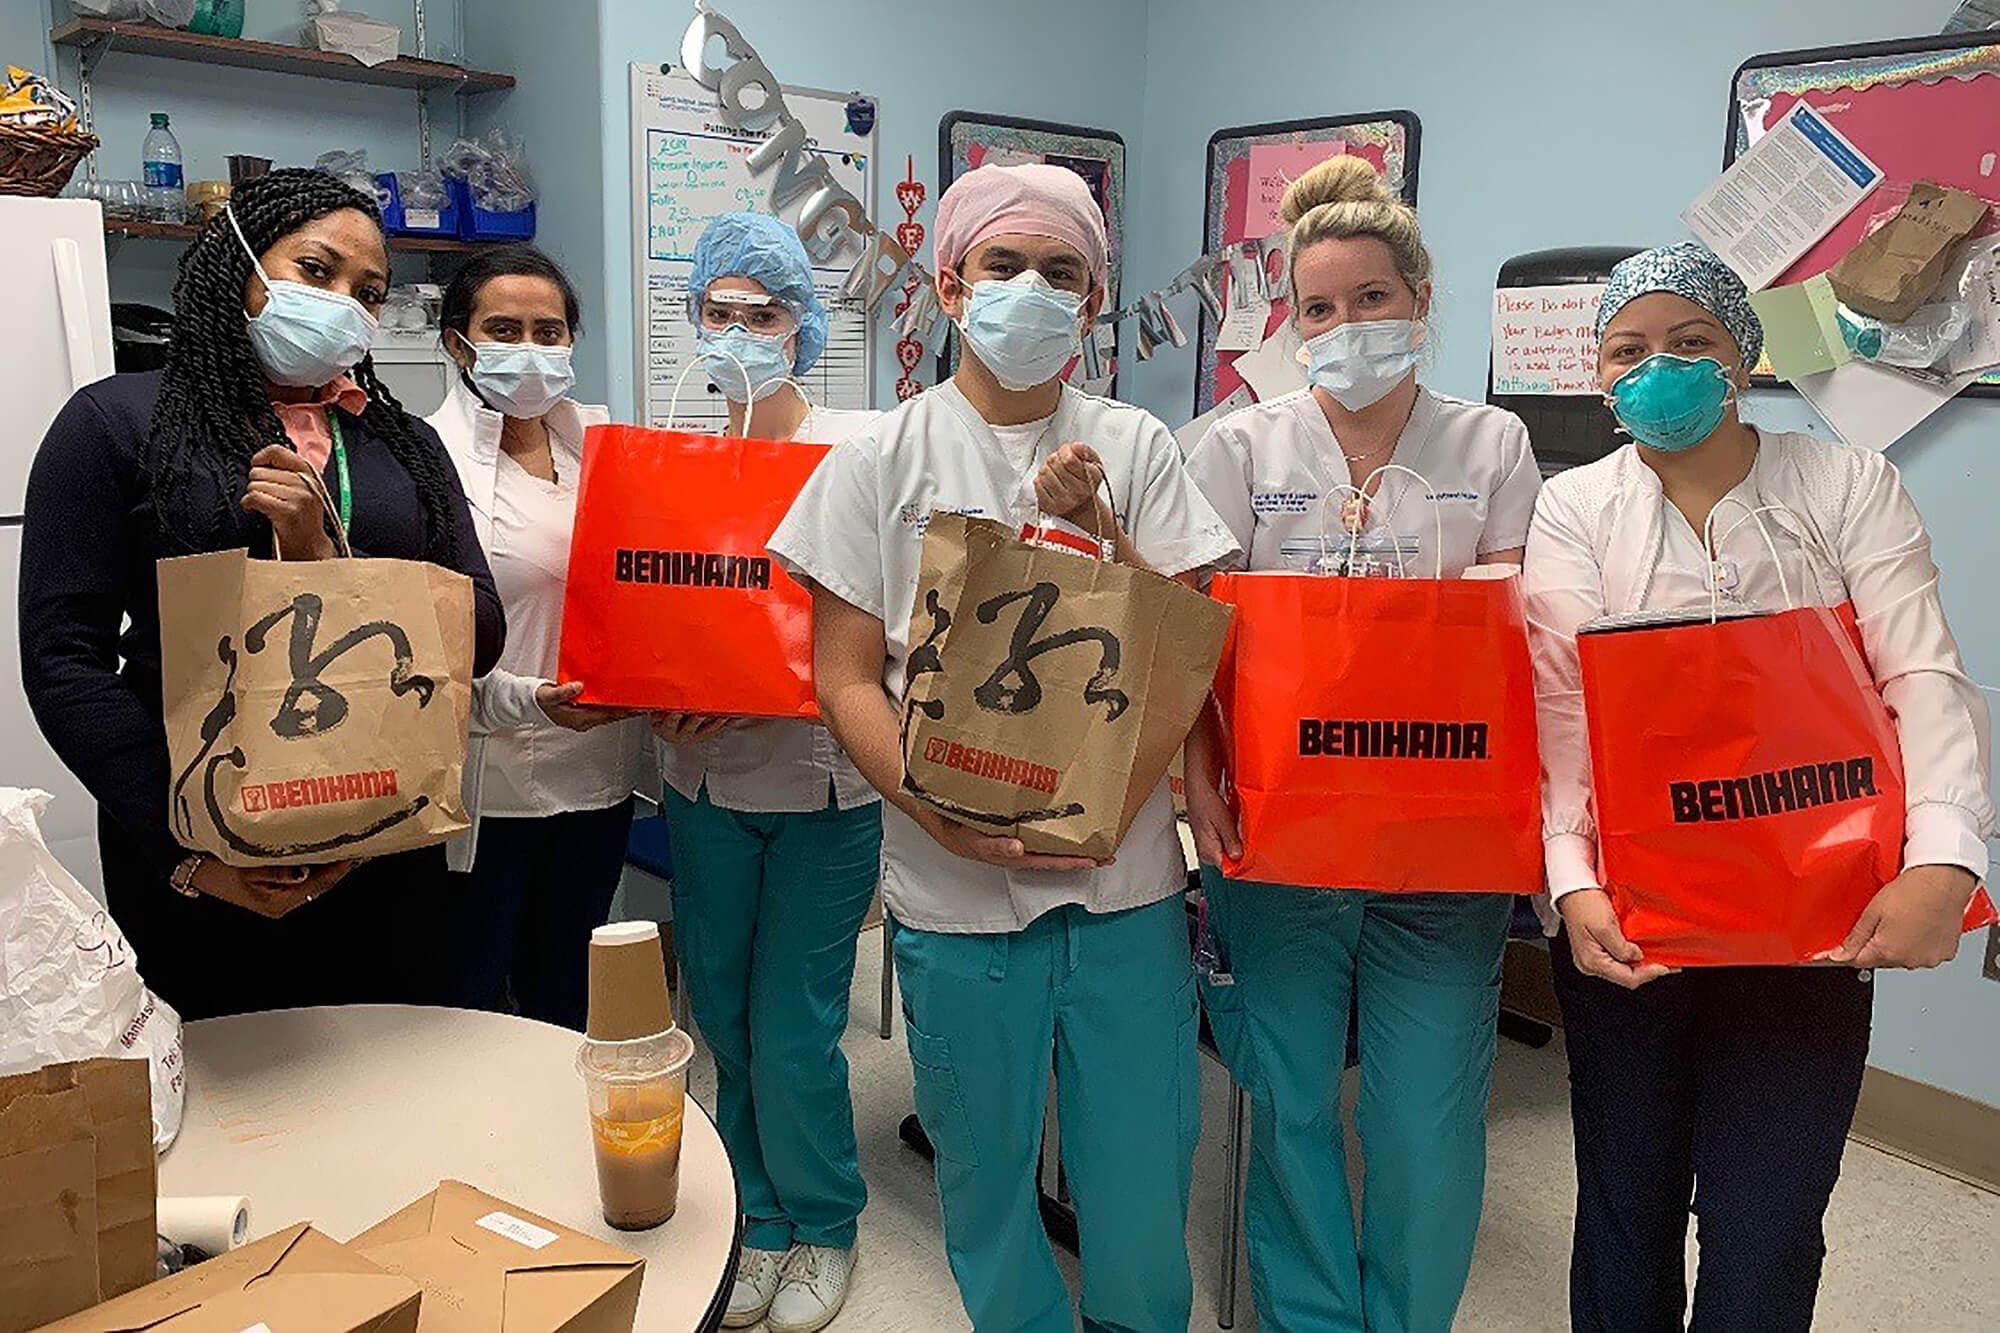 Benihana Manhasset donated meals to Long Island Jewish Medical Center